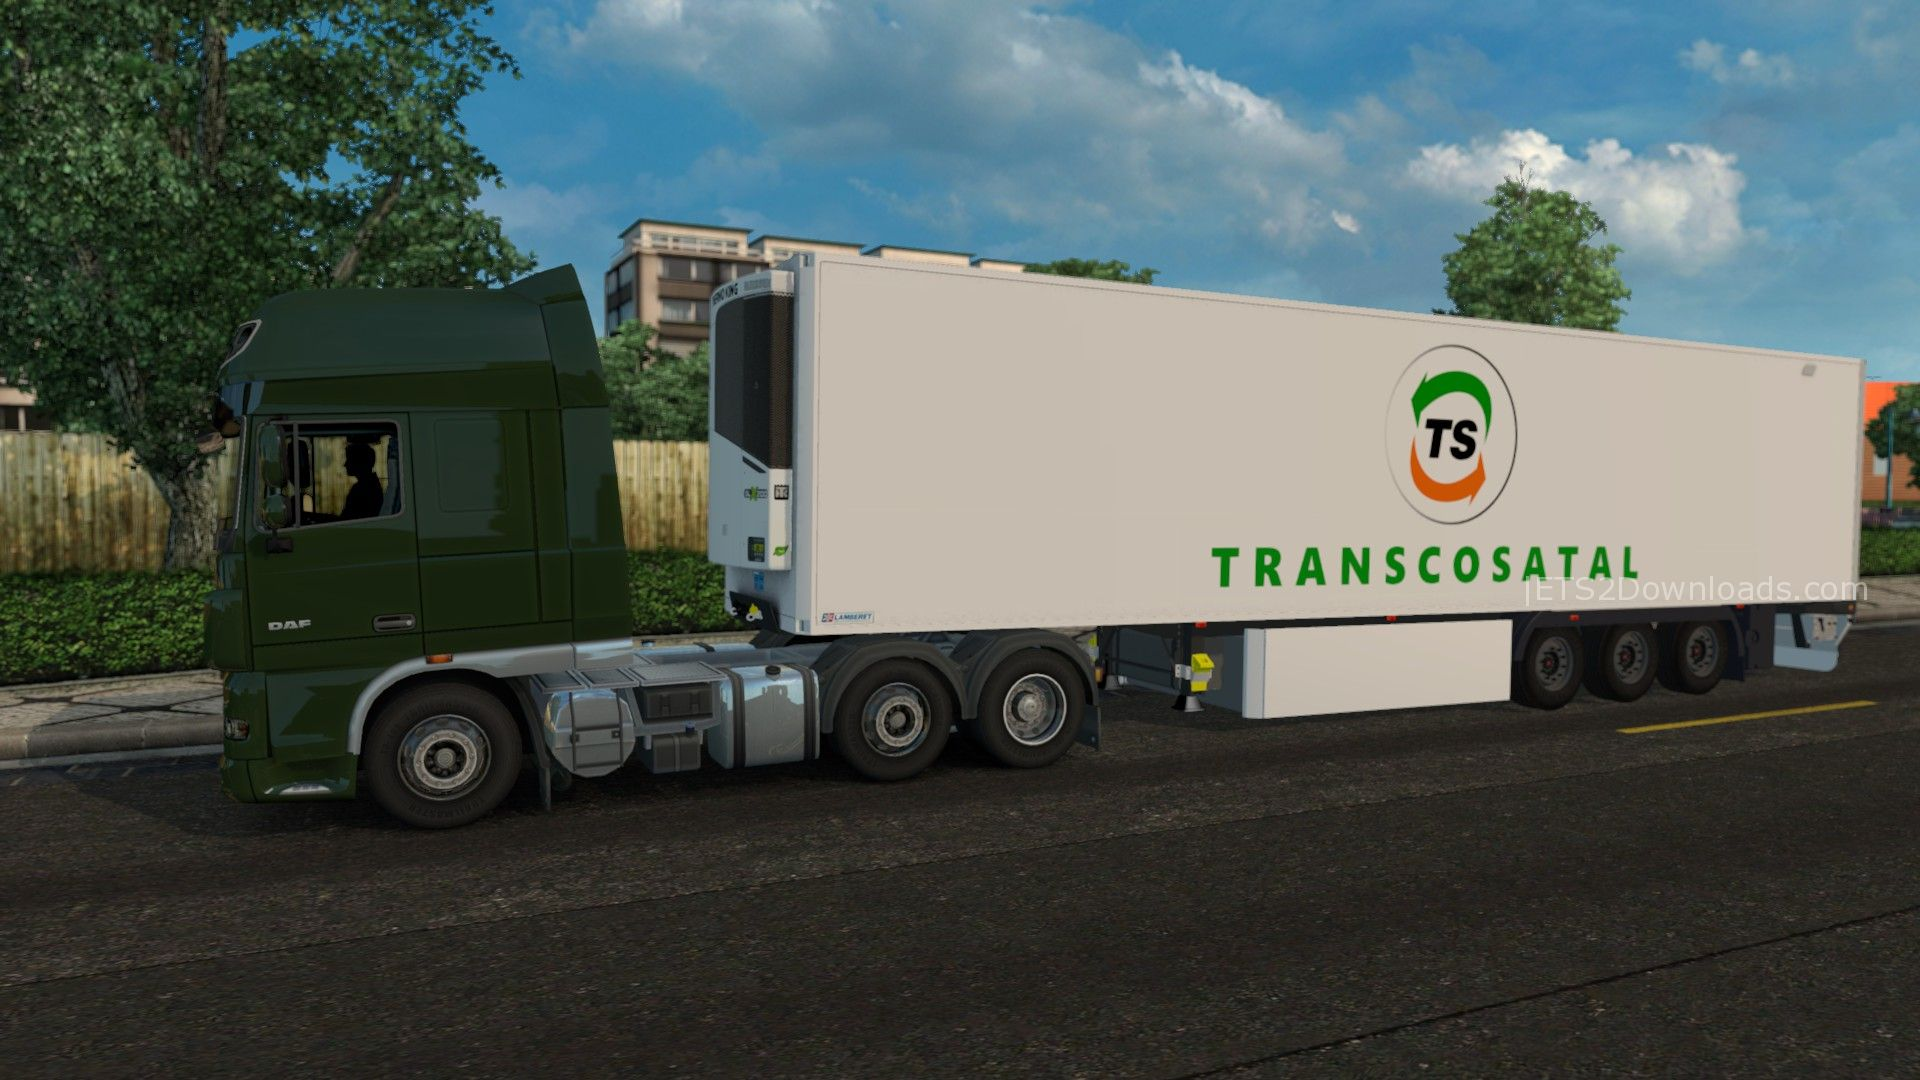 transcosatal-lamberet-sr2-trailer-2